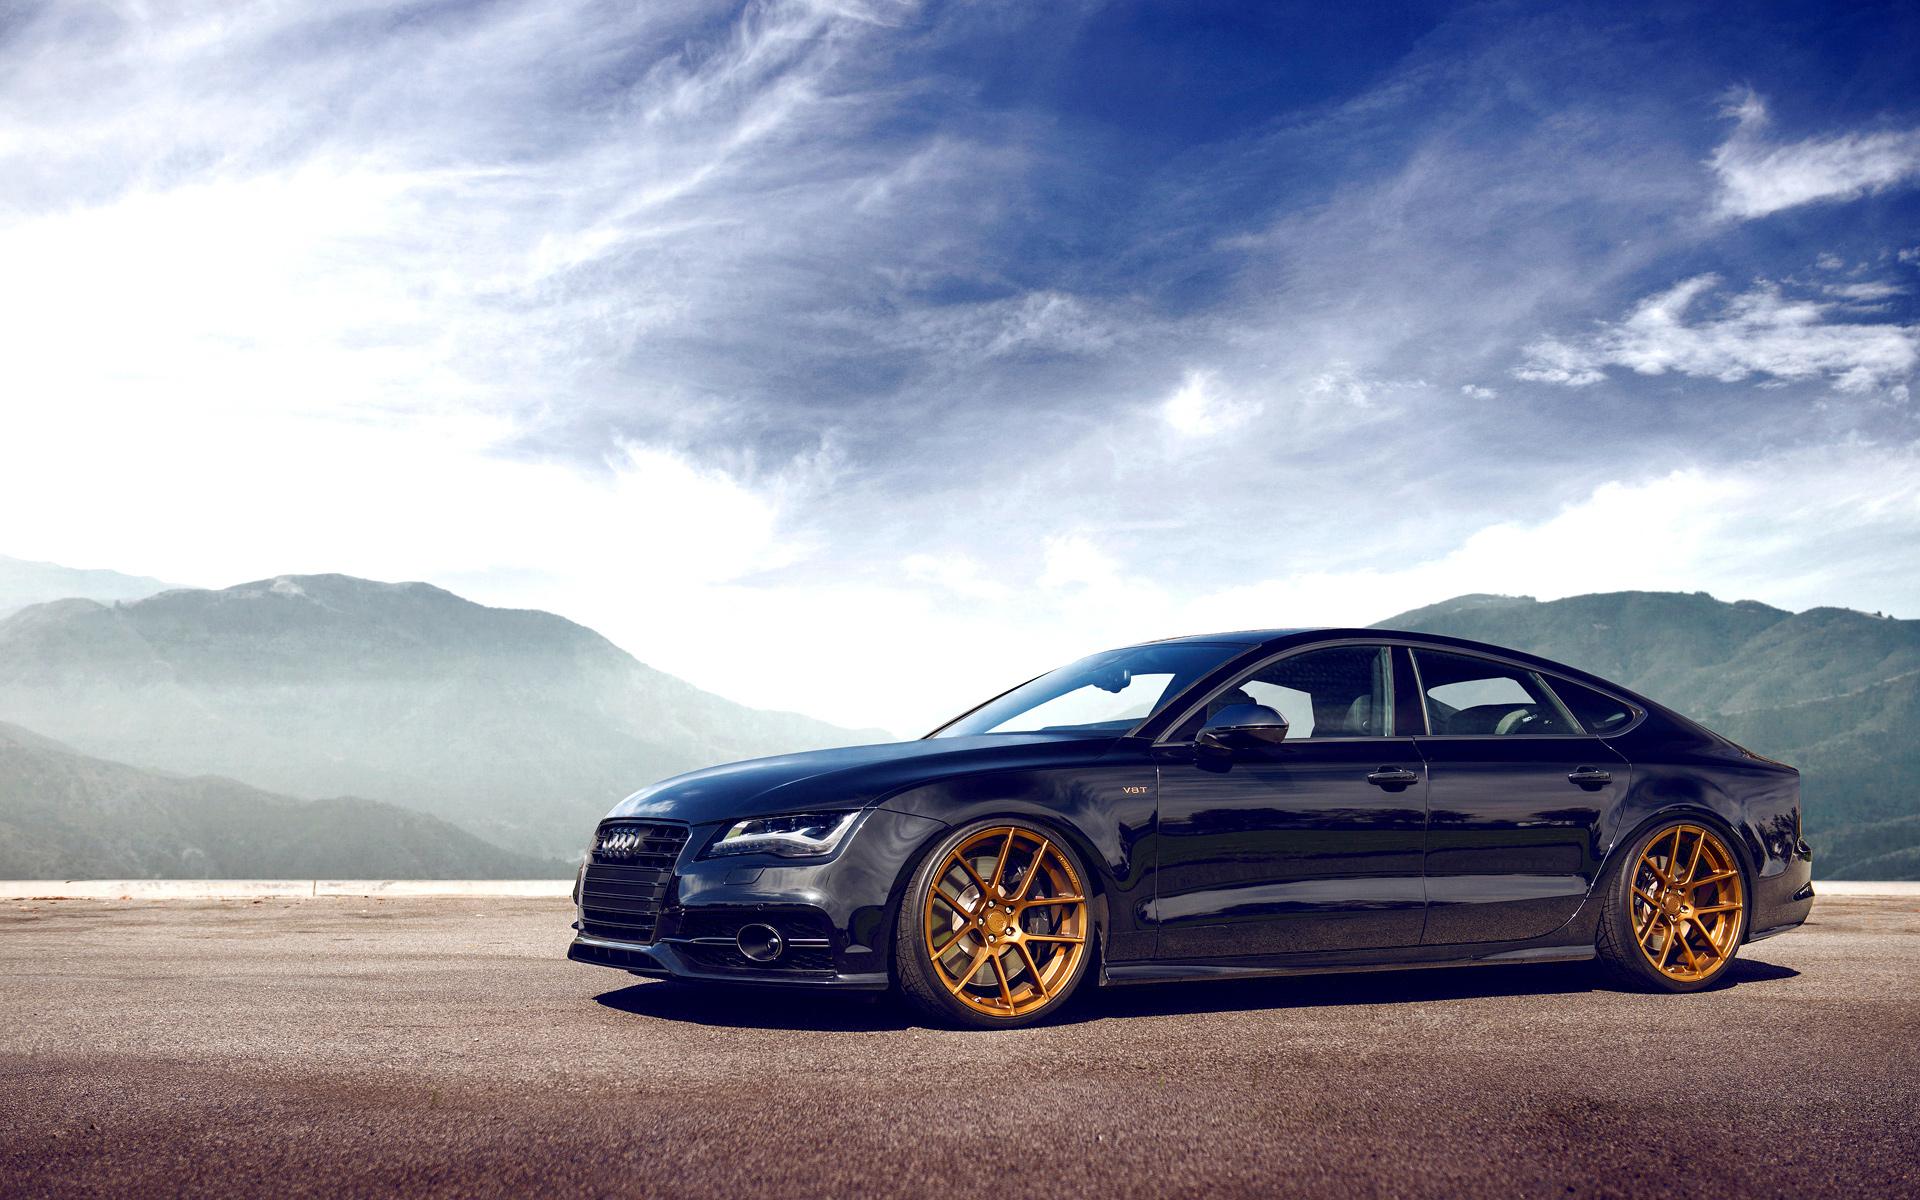 Audi A7 Full Hd Fond D 233 Cran And Arri 232 Re Plan 1920x1200